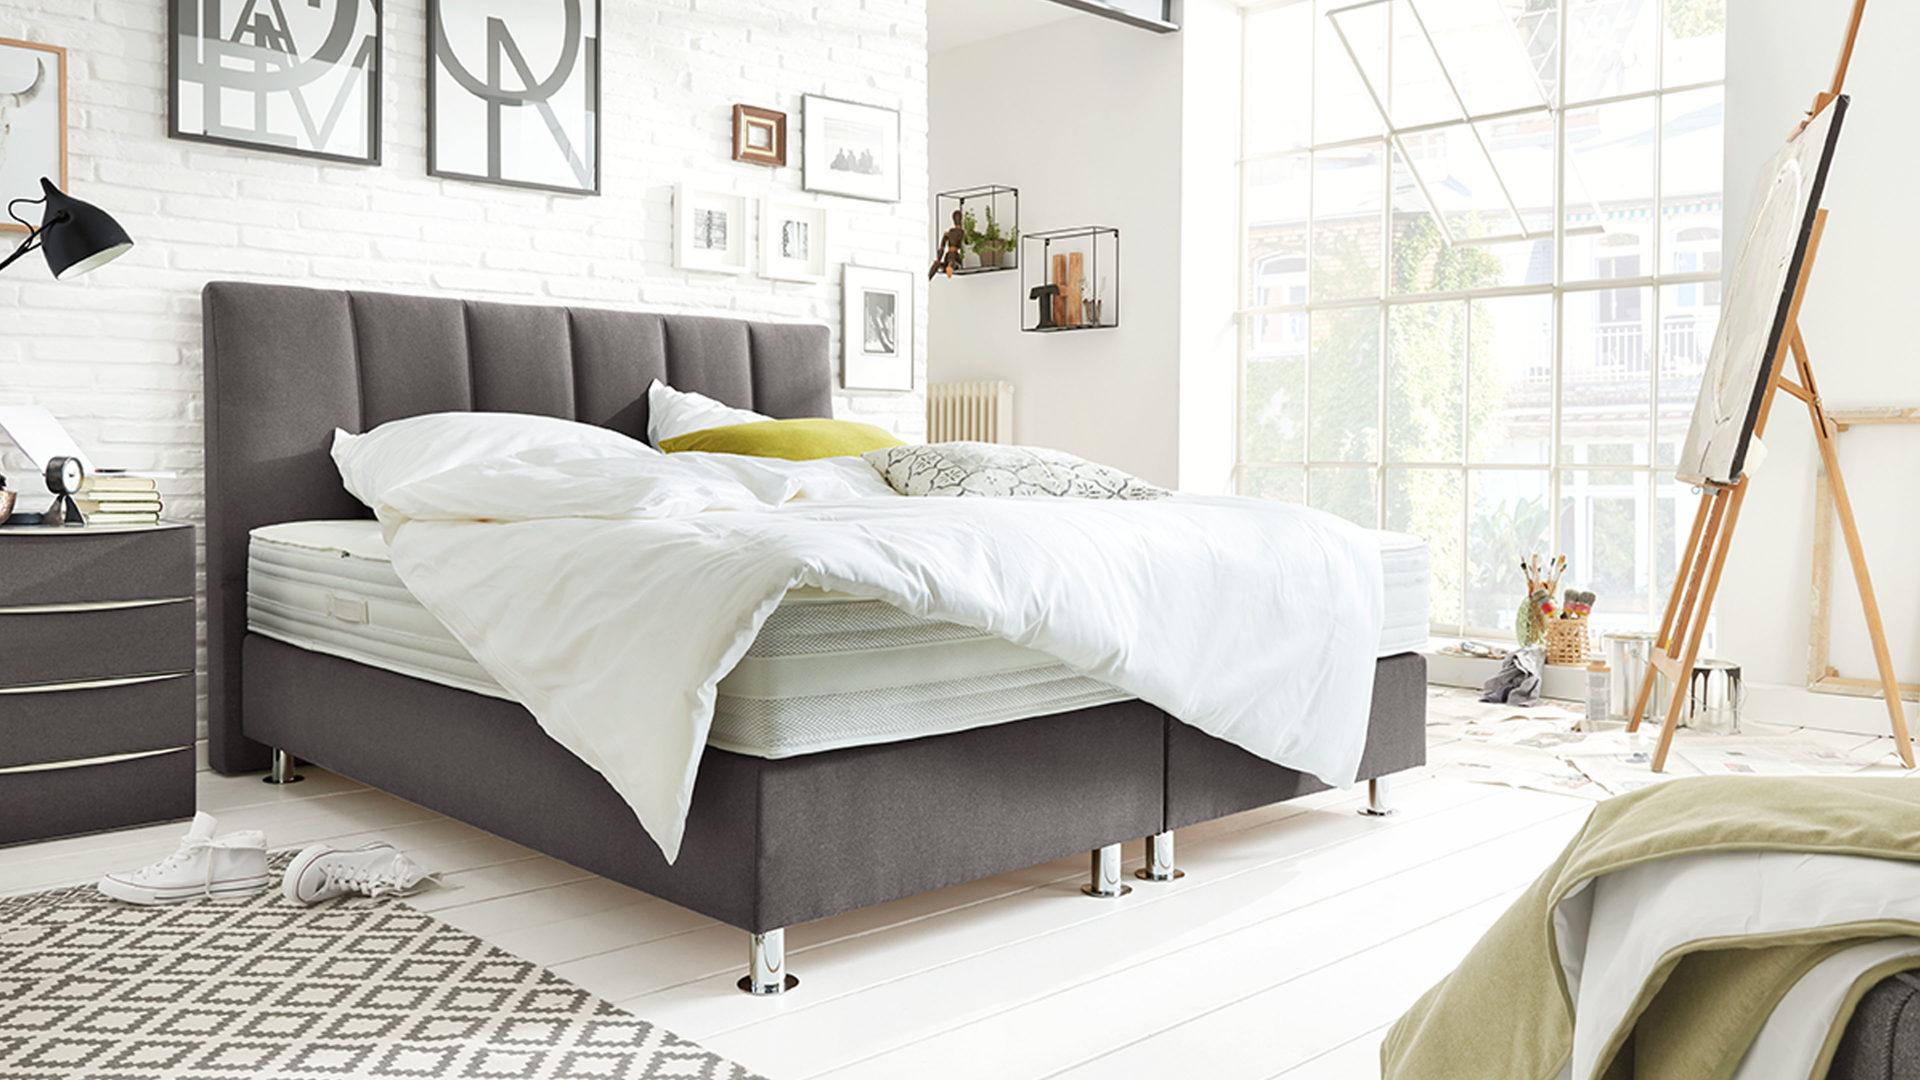 Mobel Bohn Crailsheim Raume Schlafzimmer Betten Interliving